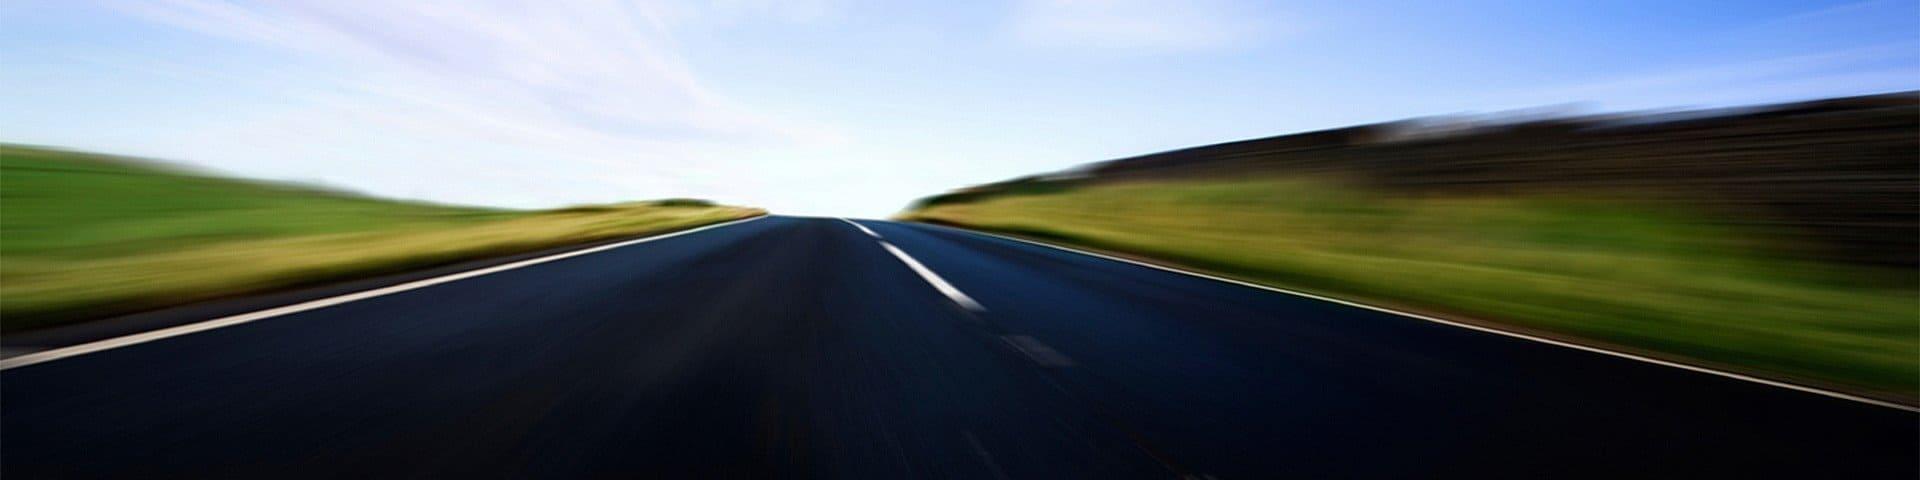 Autonoleggio con ionoleggioauto.com